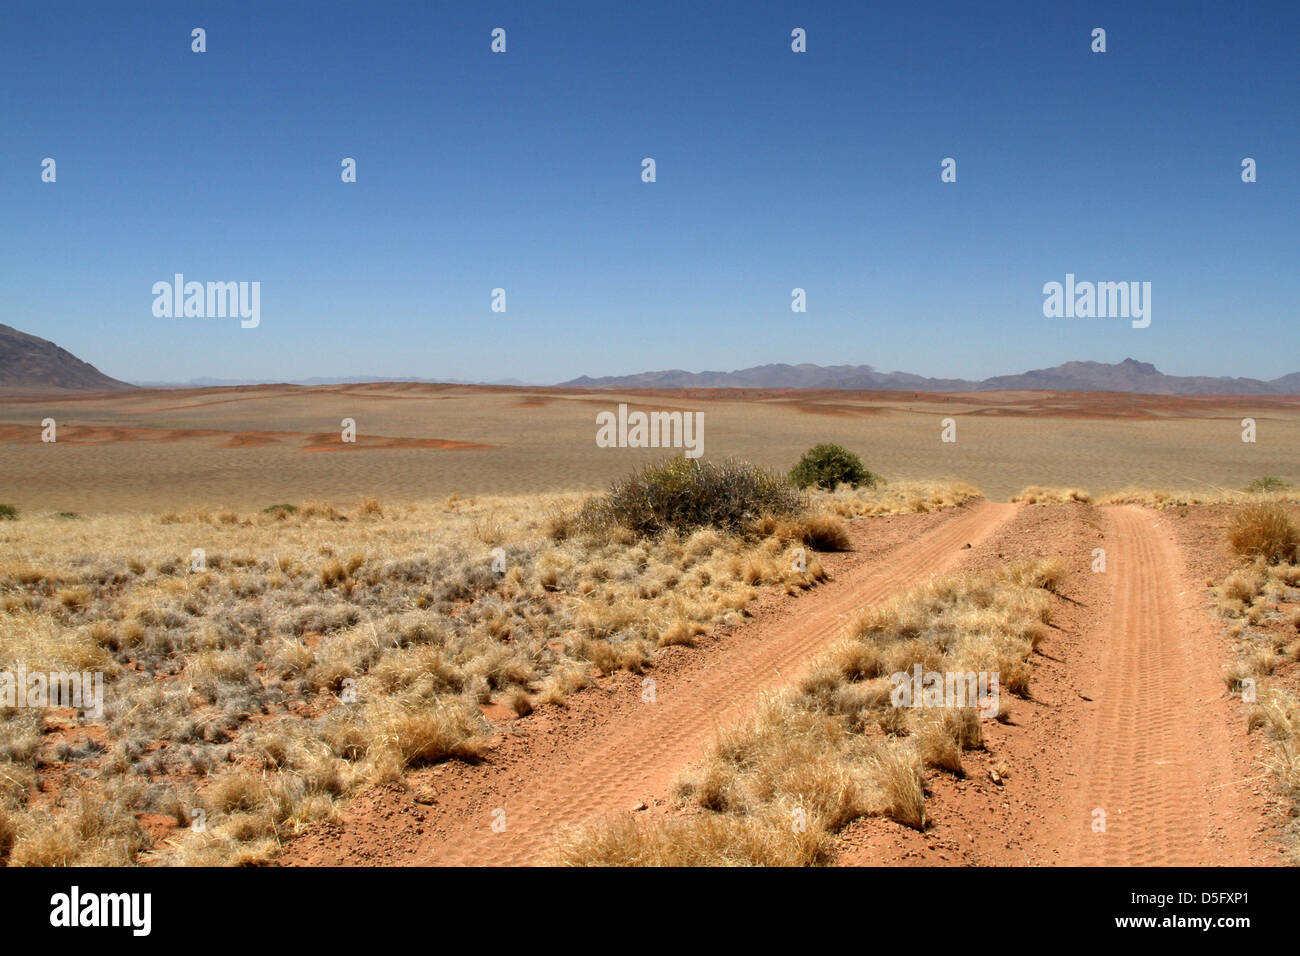 Namibrand Vista - Stock Image